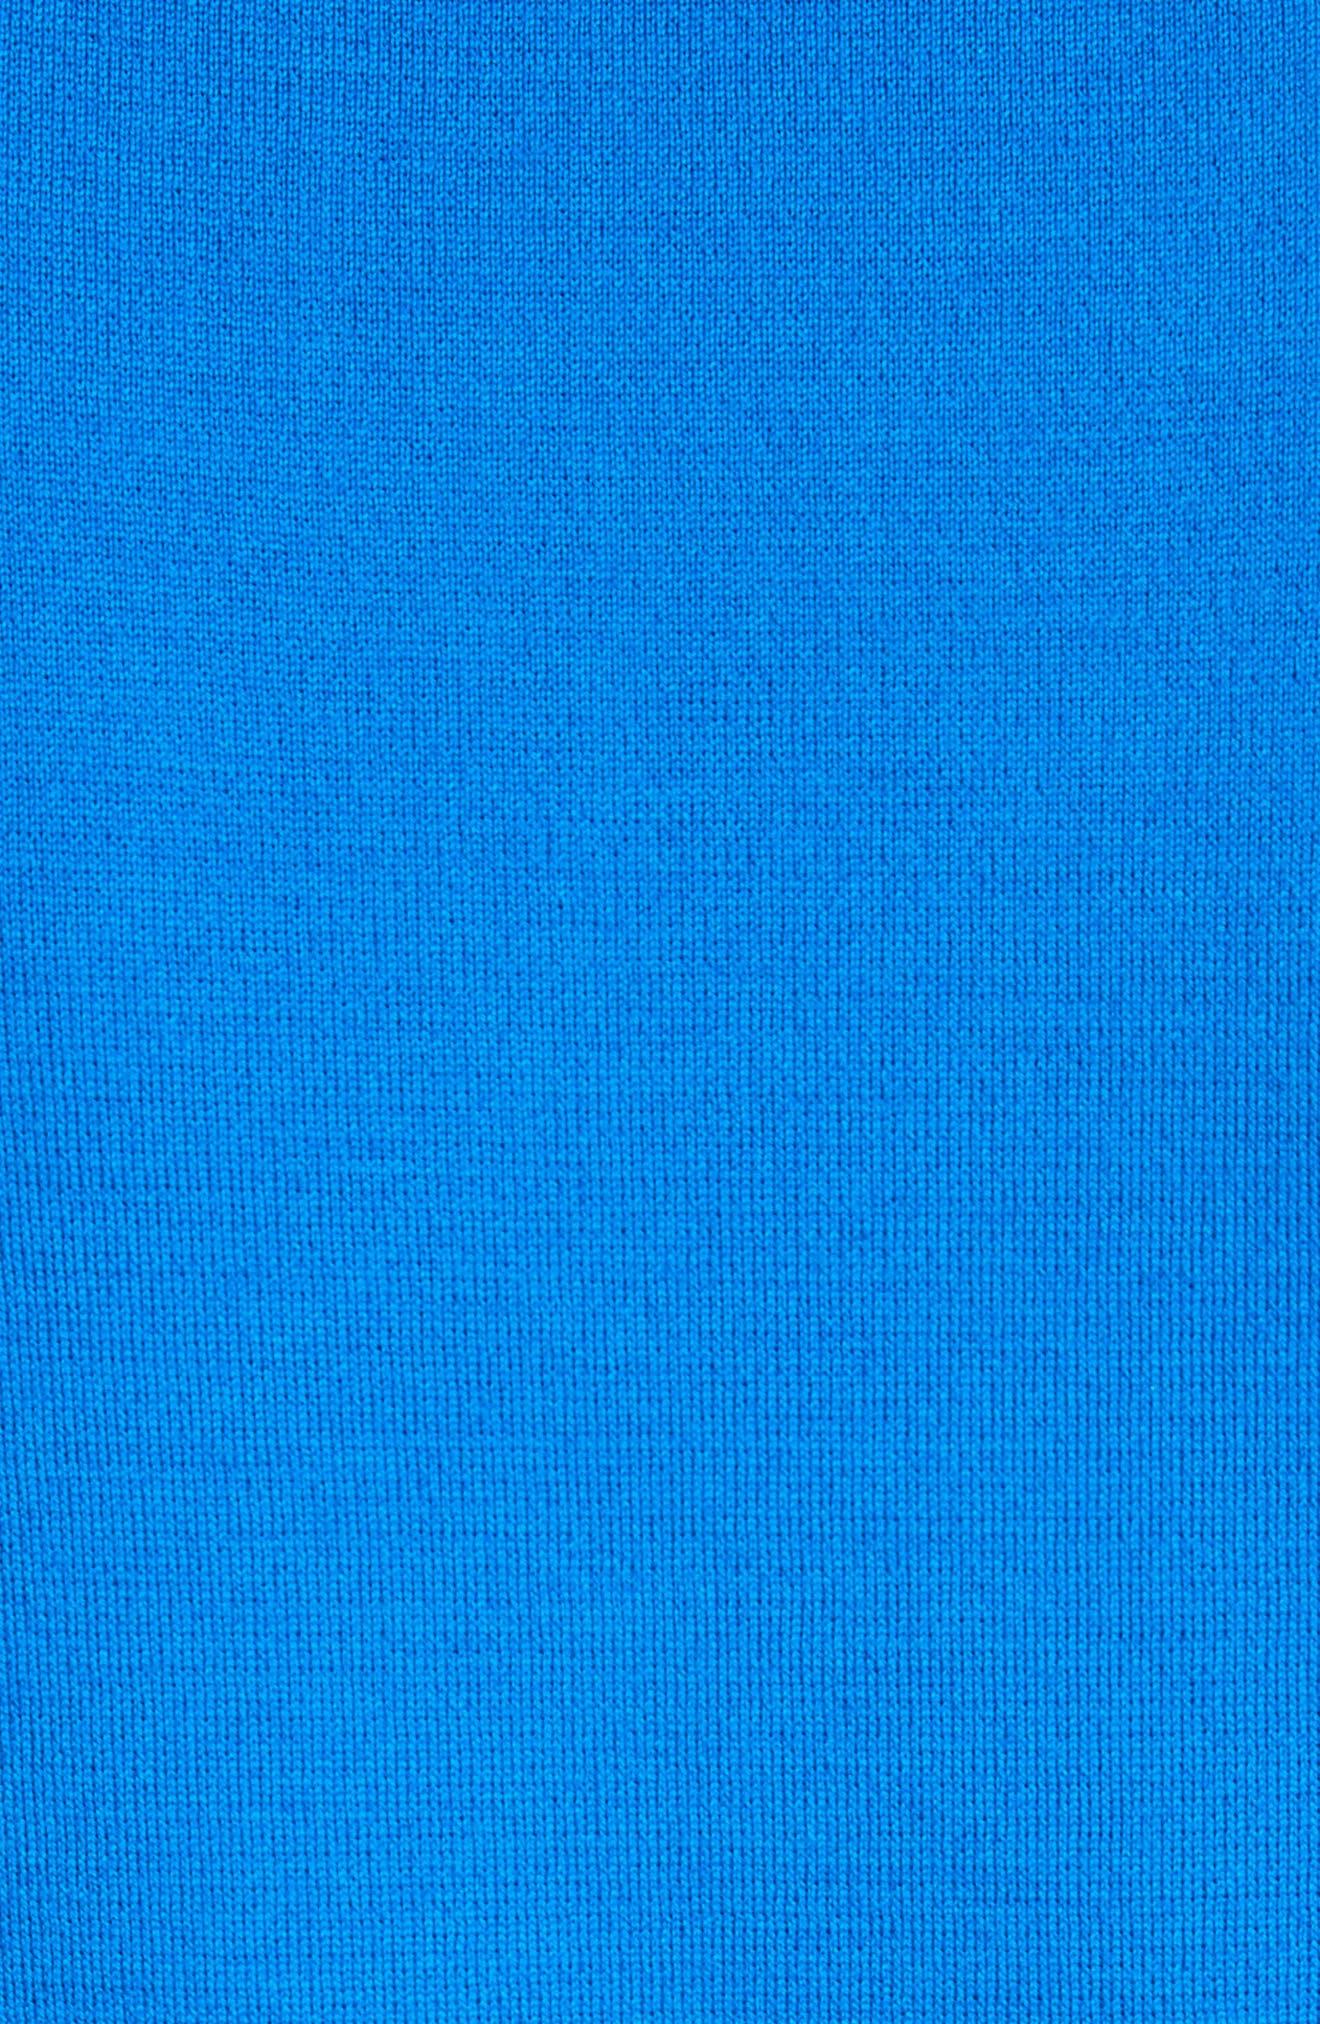 Milano Knit Contour Shell,                             Alternate thumbnail 5, color,                             430